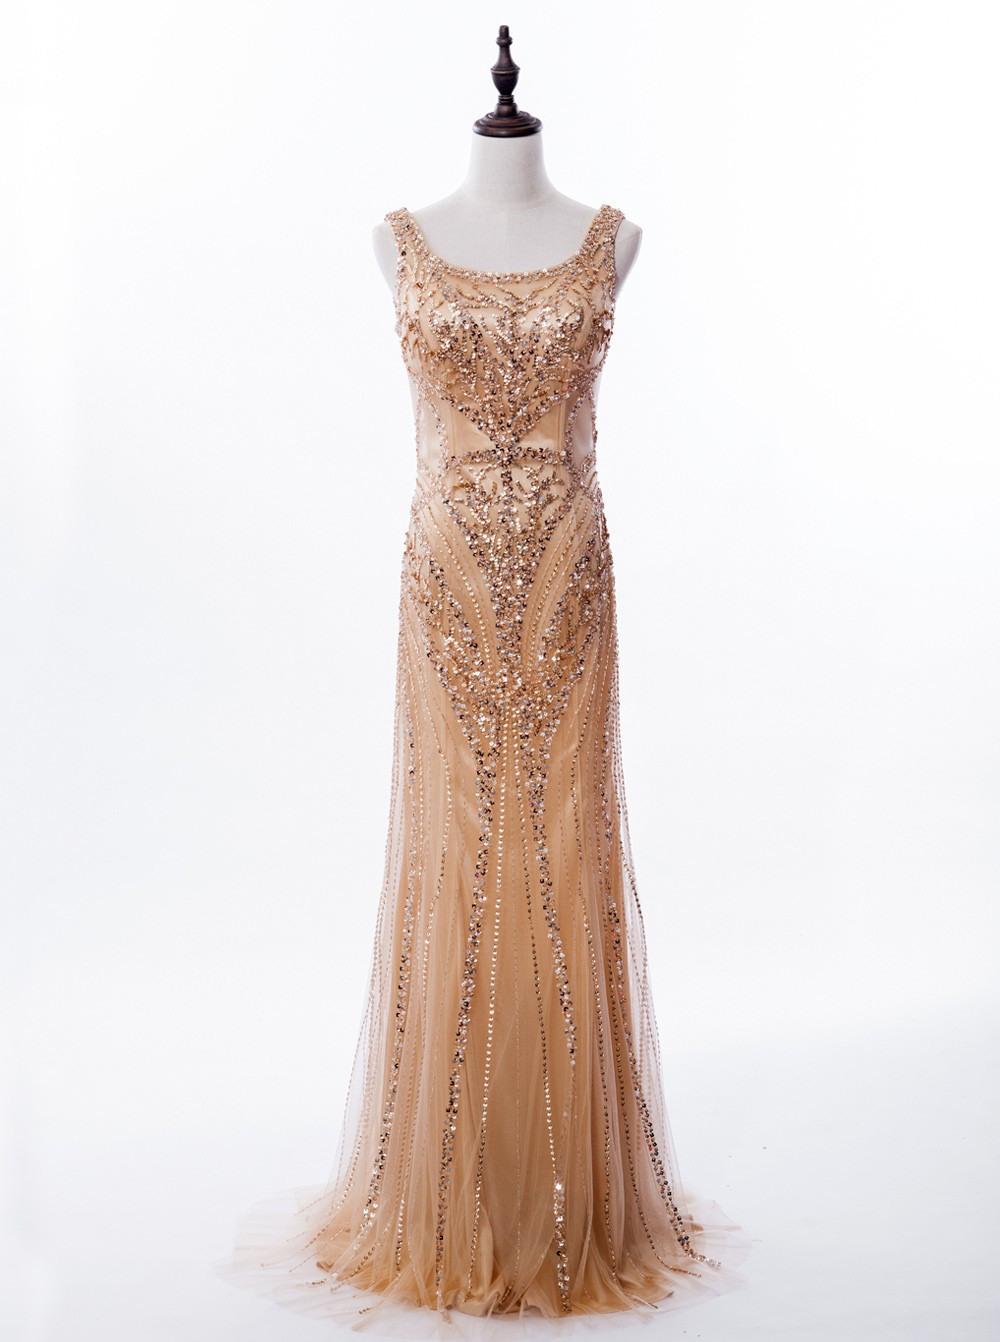 20 Genial Abendkleid Pailletten ÄrmelFormal Großartig Abendkleid Pailletten Vertrieb